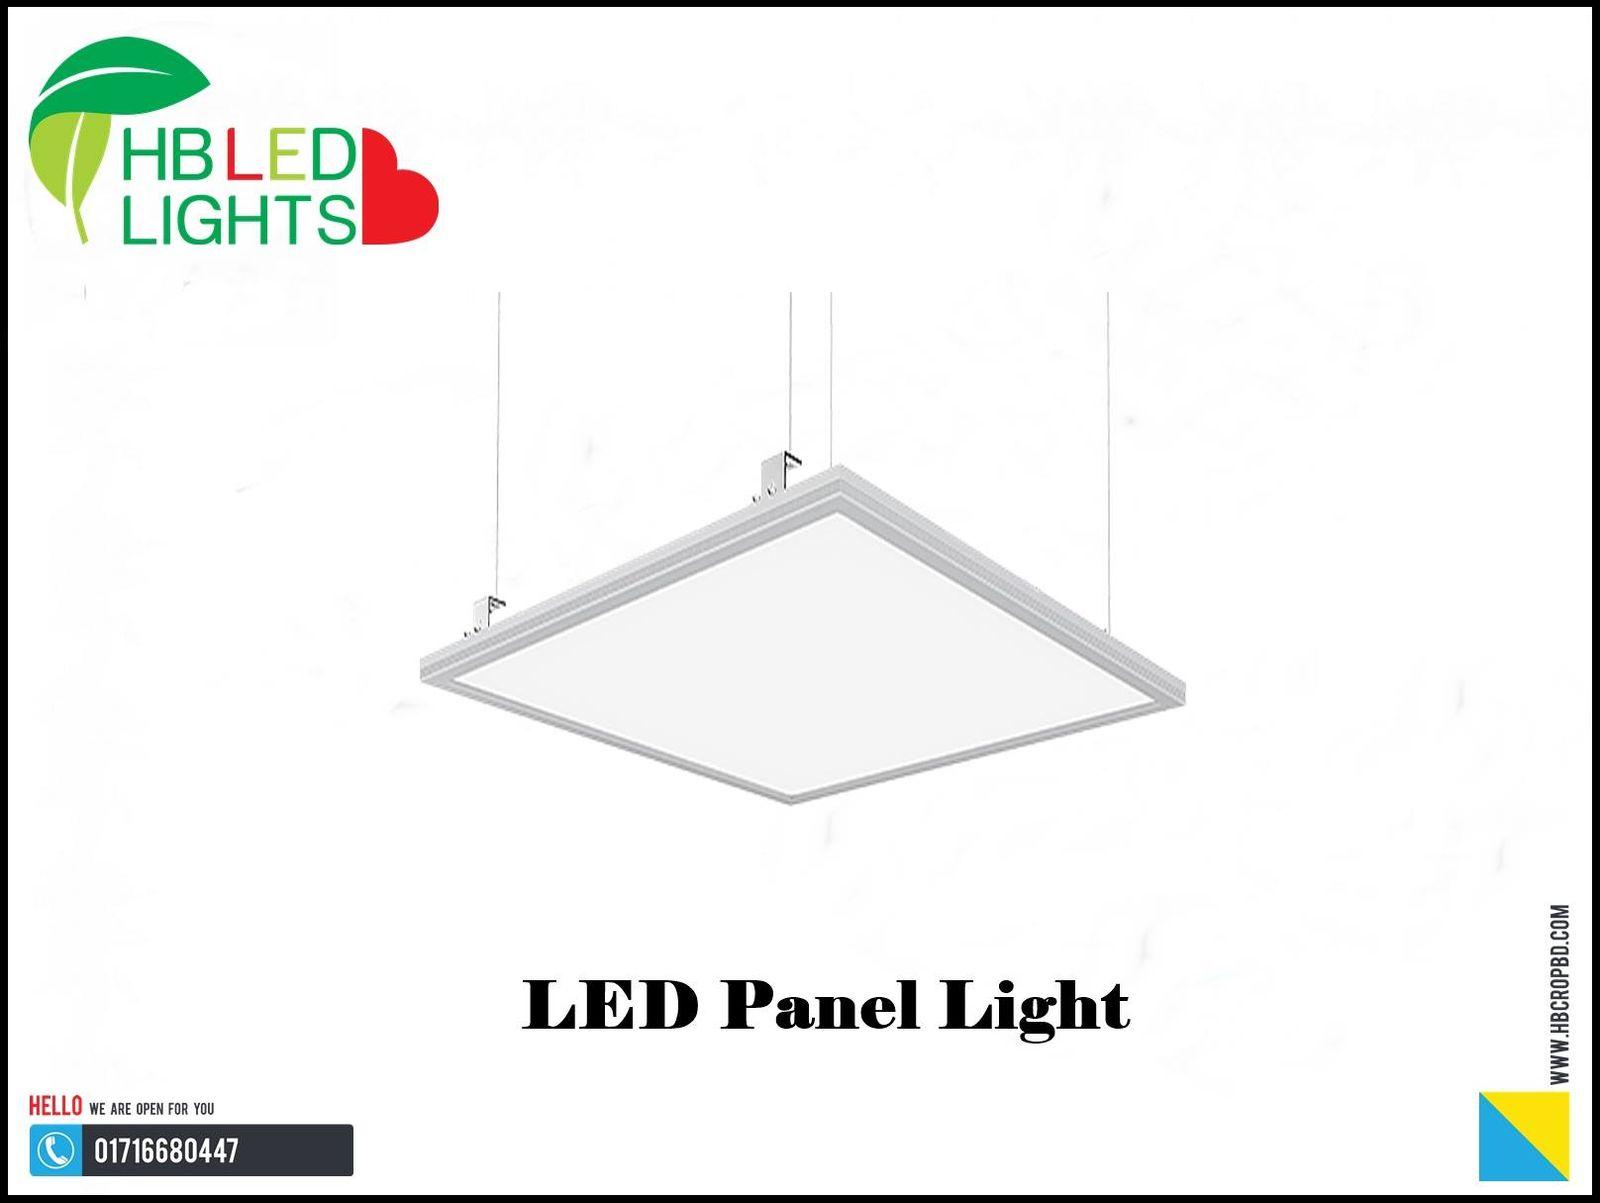 LED 2x2 panel light